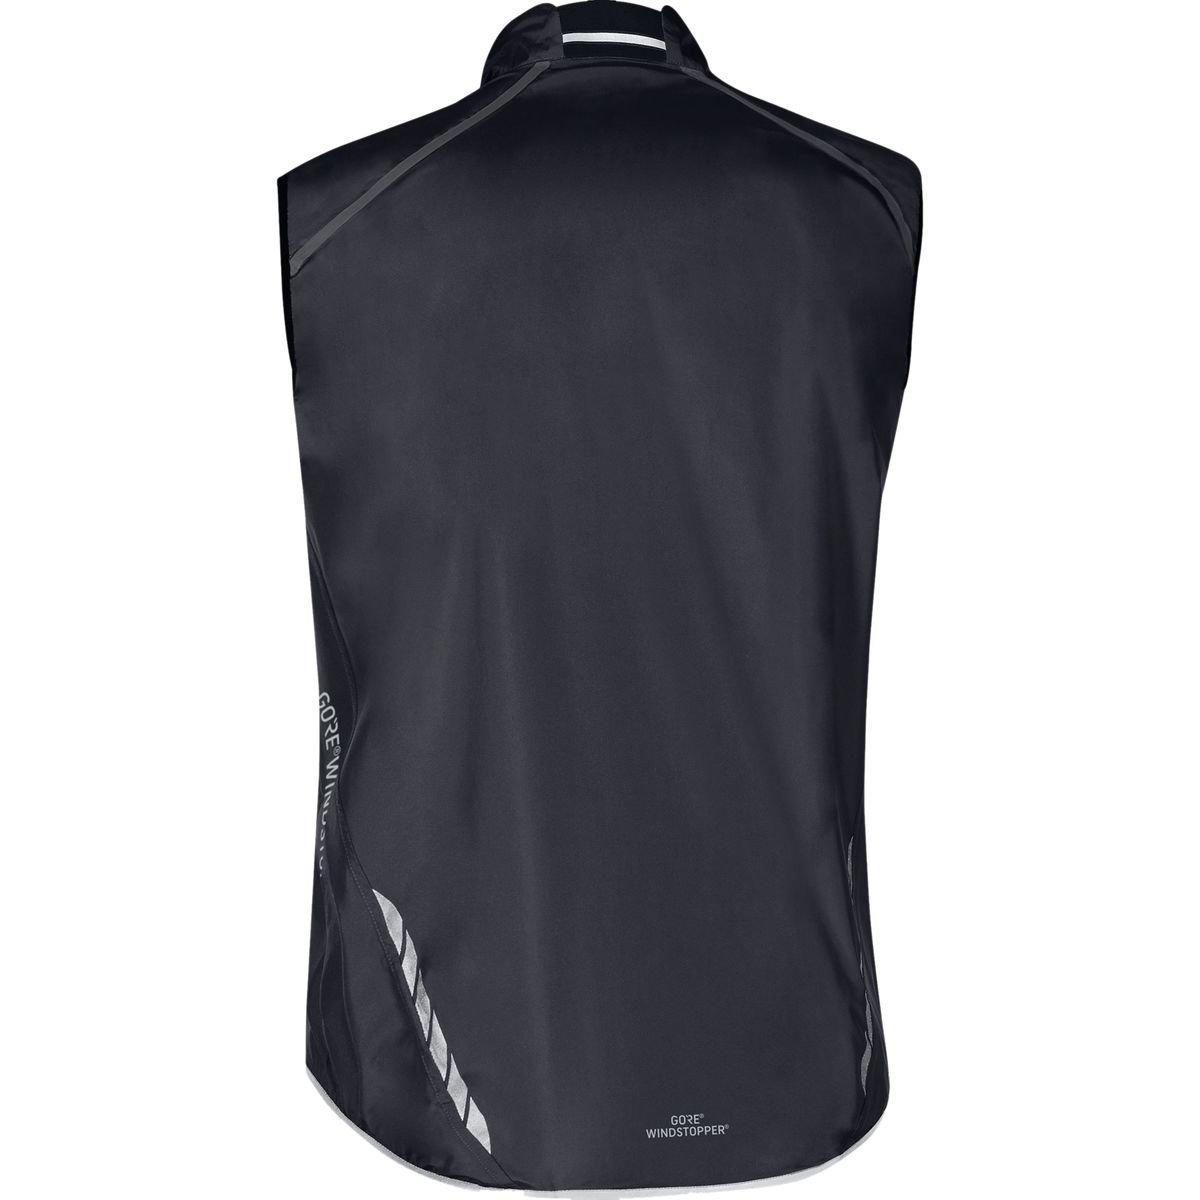 GORE BIKE WEAR, Men´s, Road cyclist vest, No sleeves, Ultra-lightweight and compact, GORE WINDSTOPPER, OXYGEN WS AS Light, Size S, Black, VWAOXY